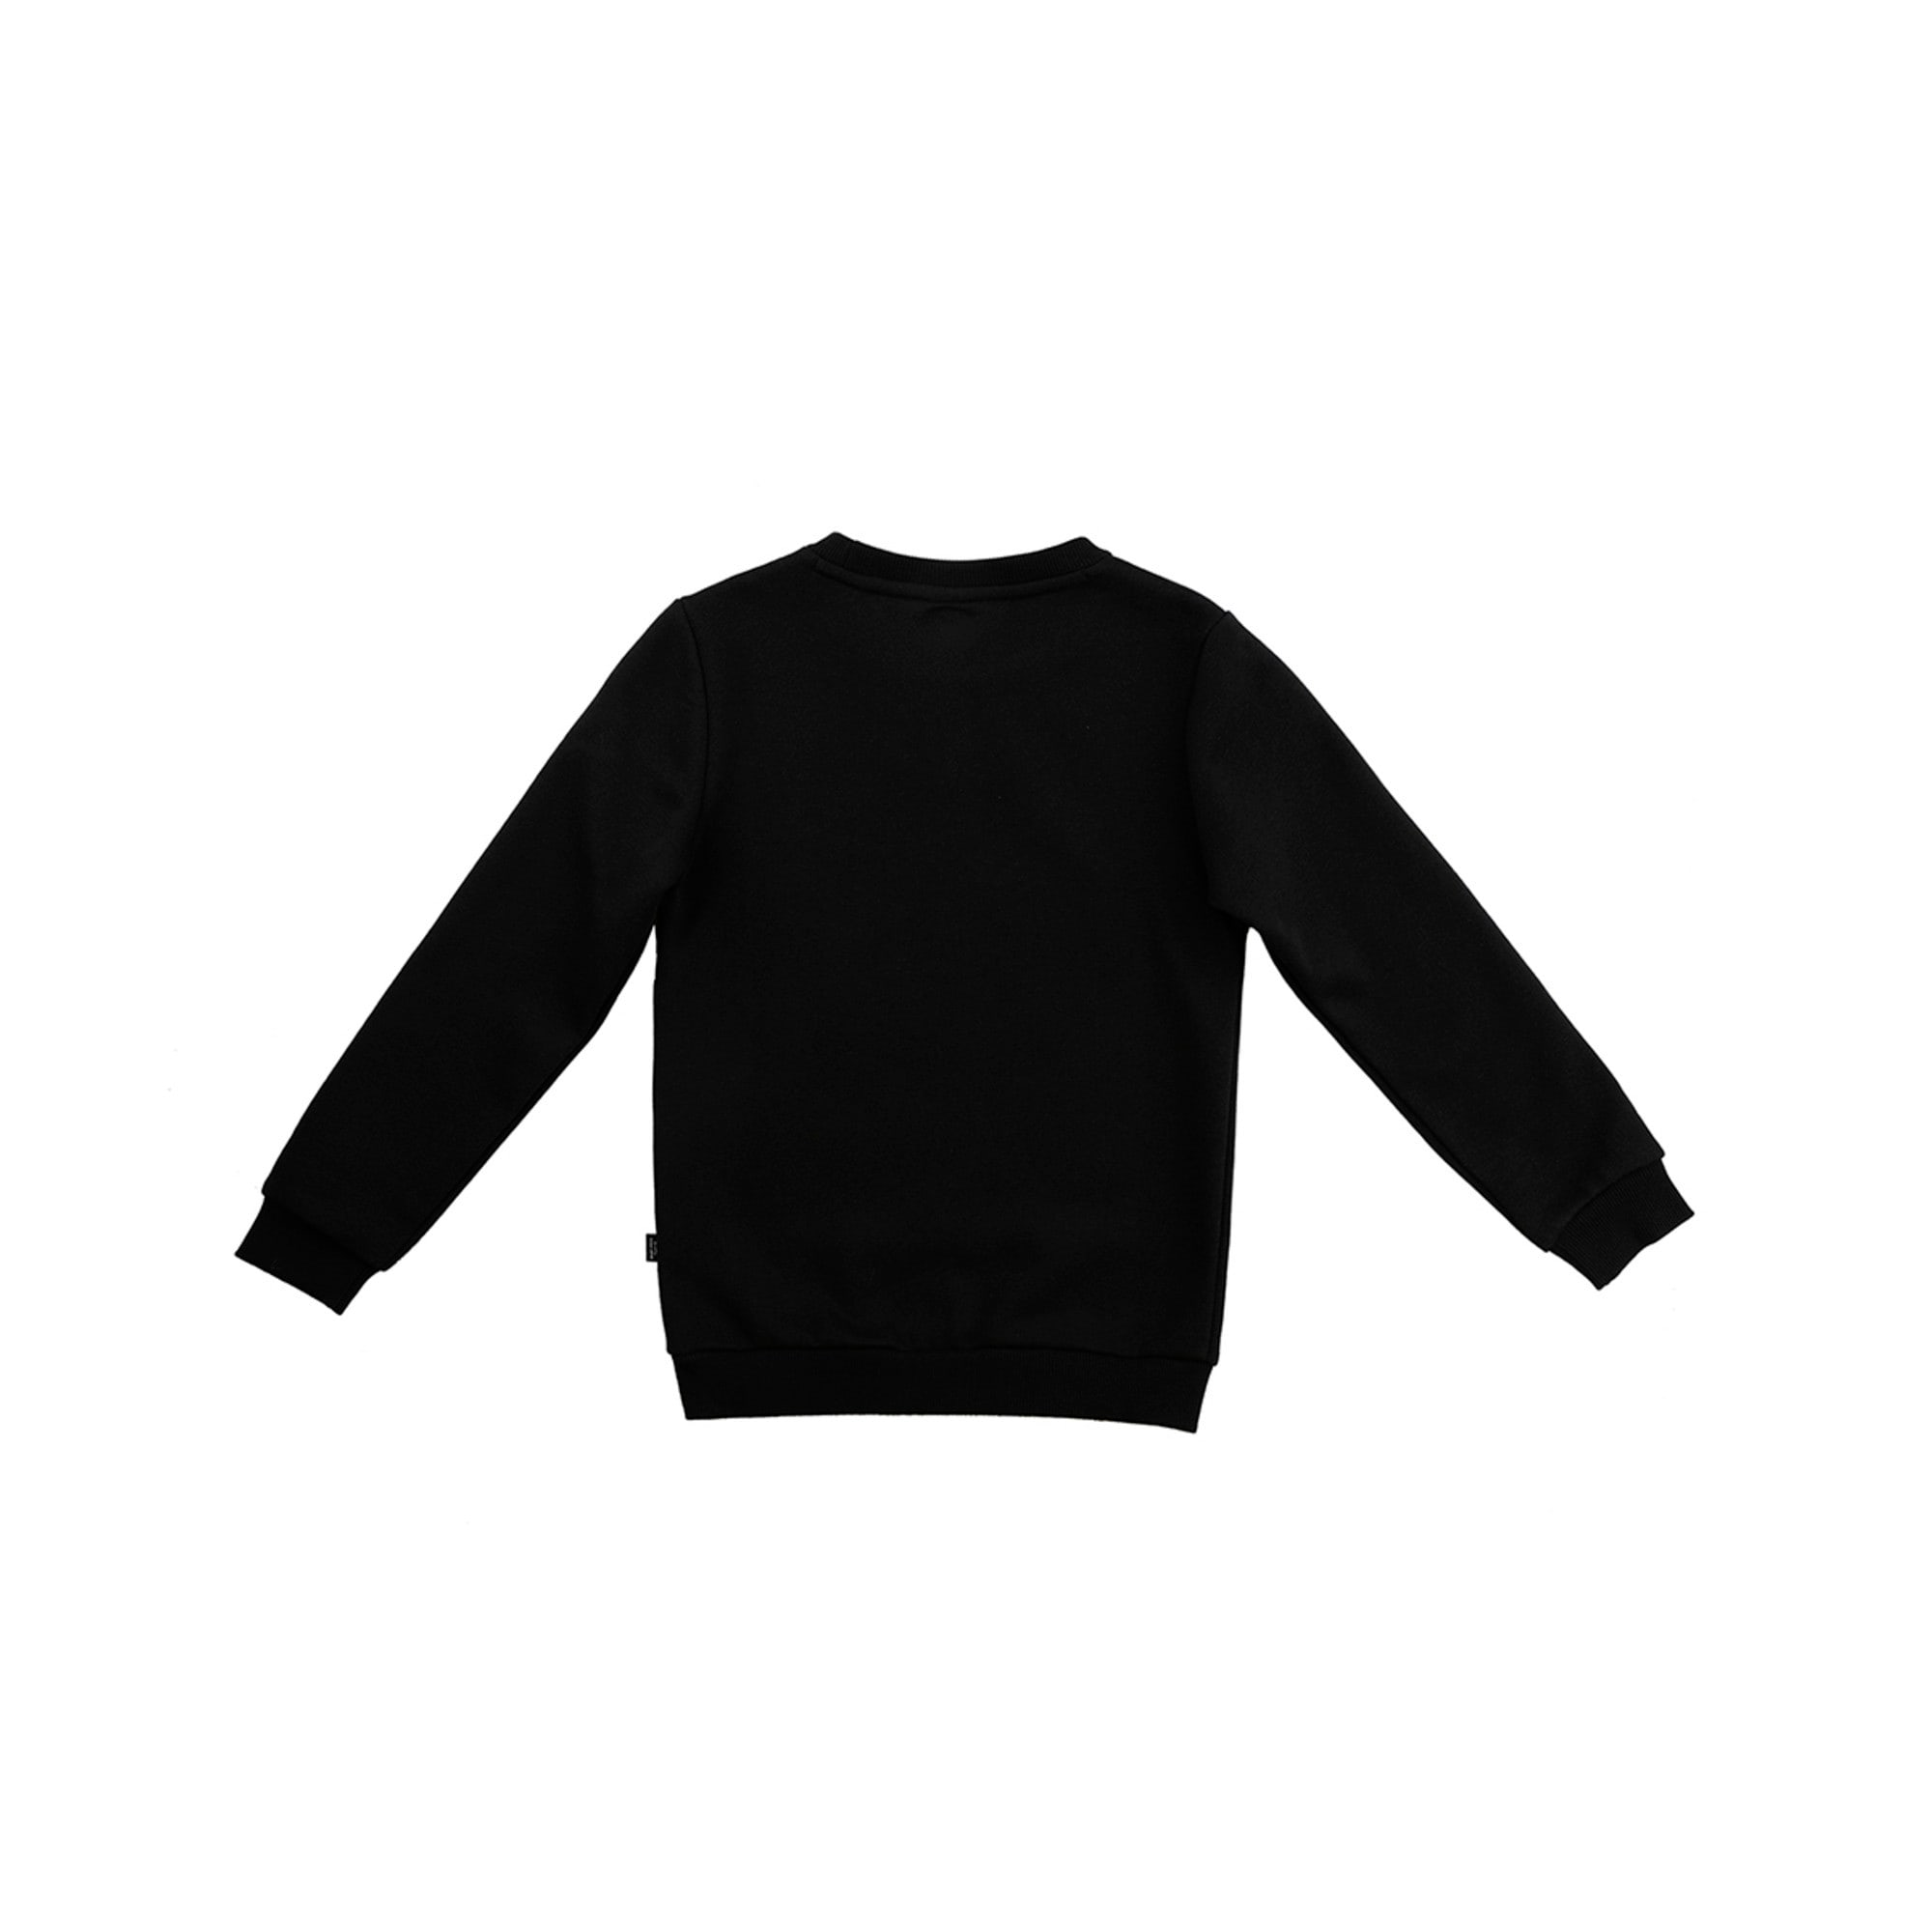 Thumbnail 2 of Boys' Crew Neck Sweater, Puma Black, medium-IND